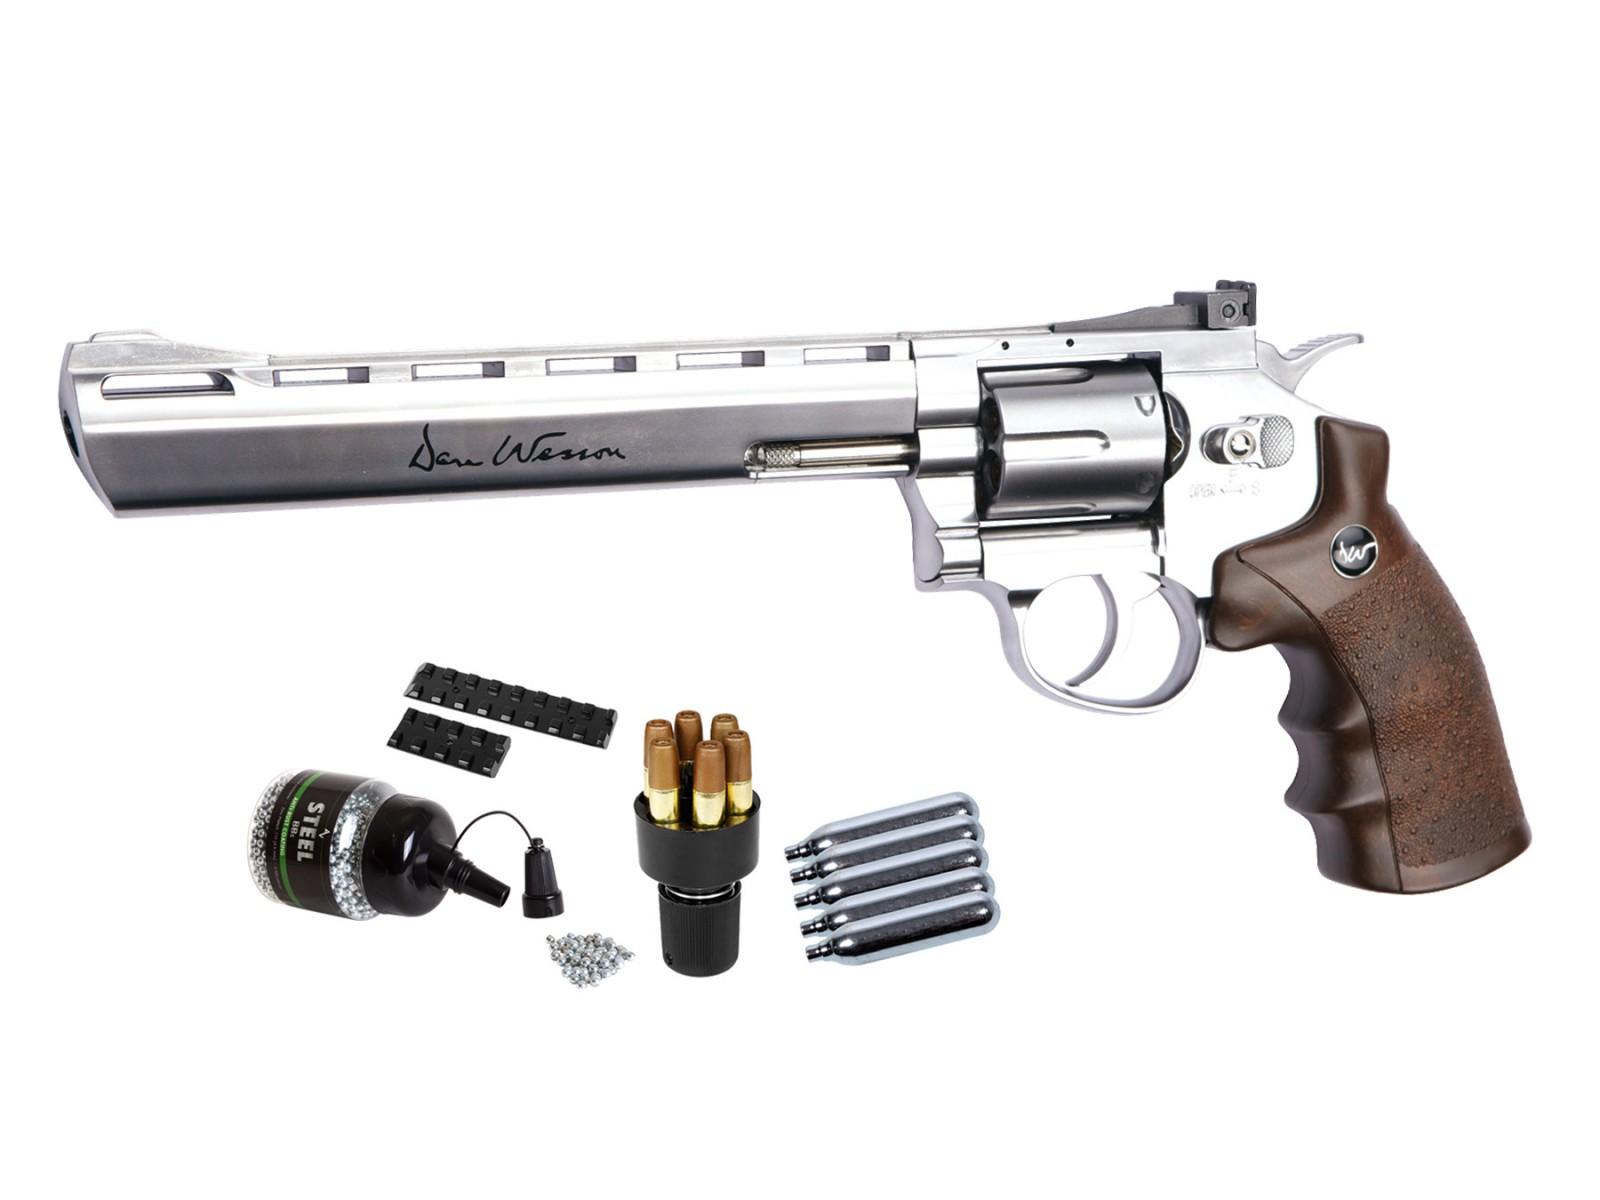 Cheap Dan Wesson 8″ CO2 BB Revolver Kit, Silver 0.177